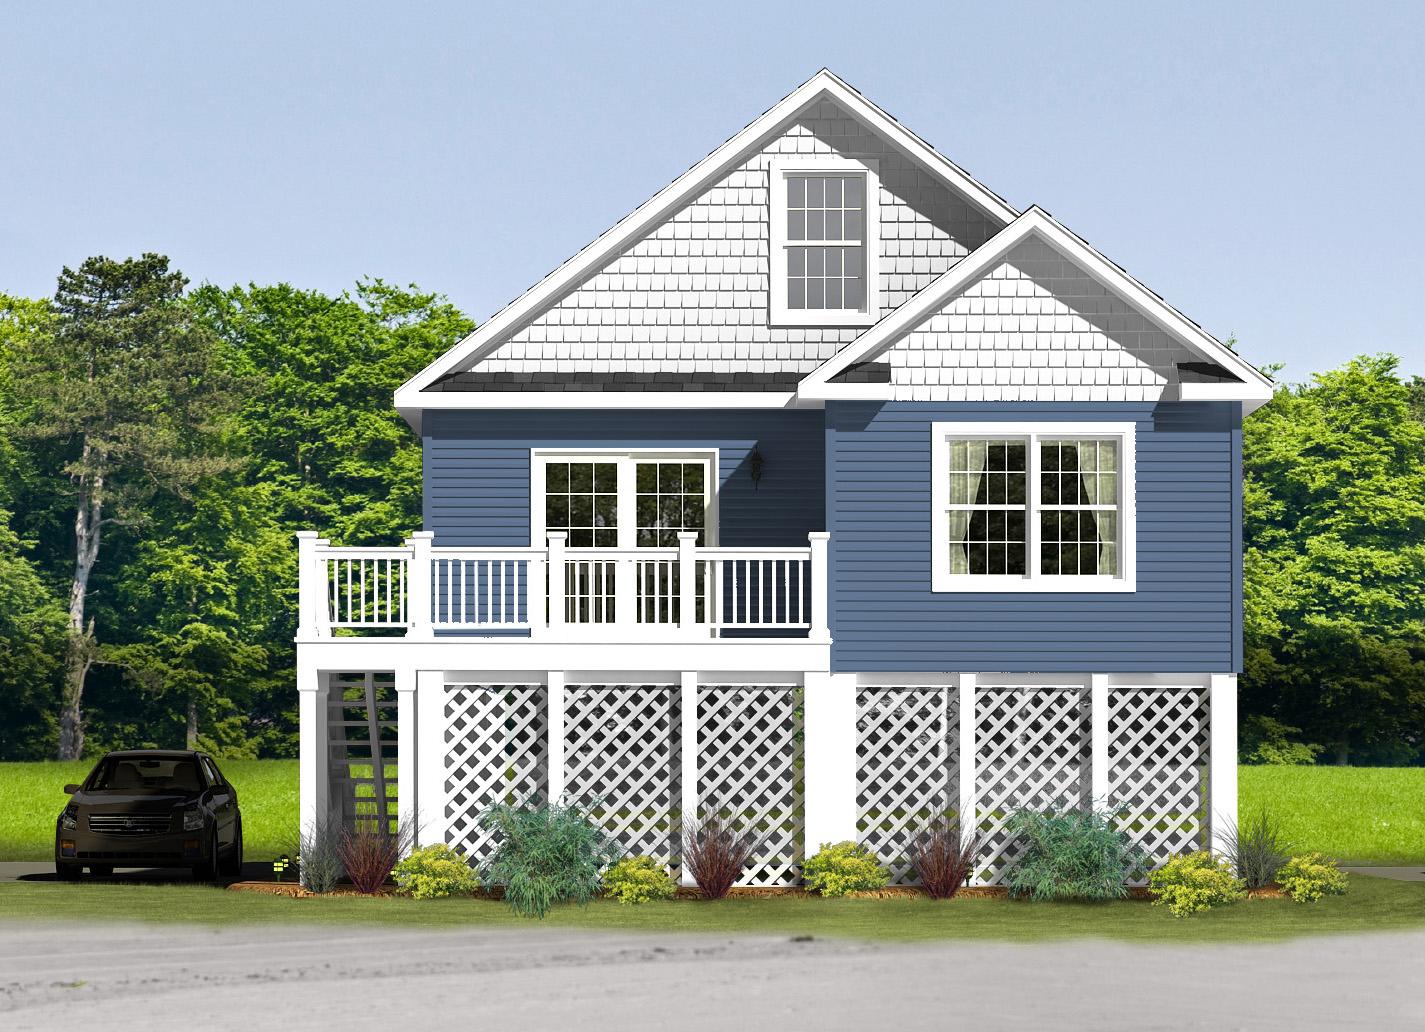 Pennwest Homes Coastal Shore Collection Modular Home Floor